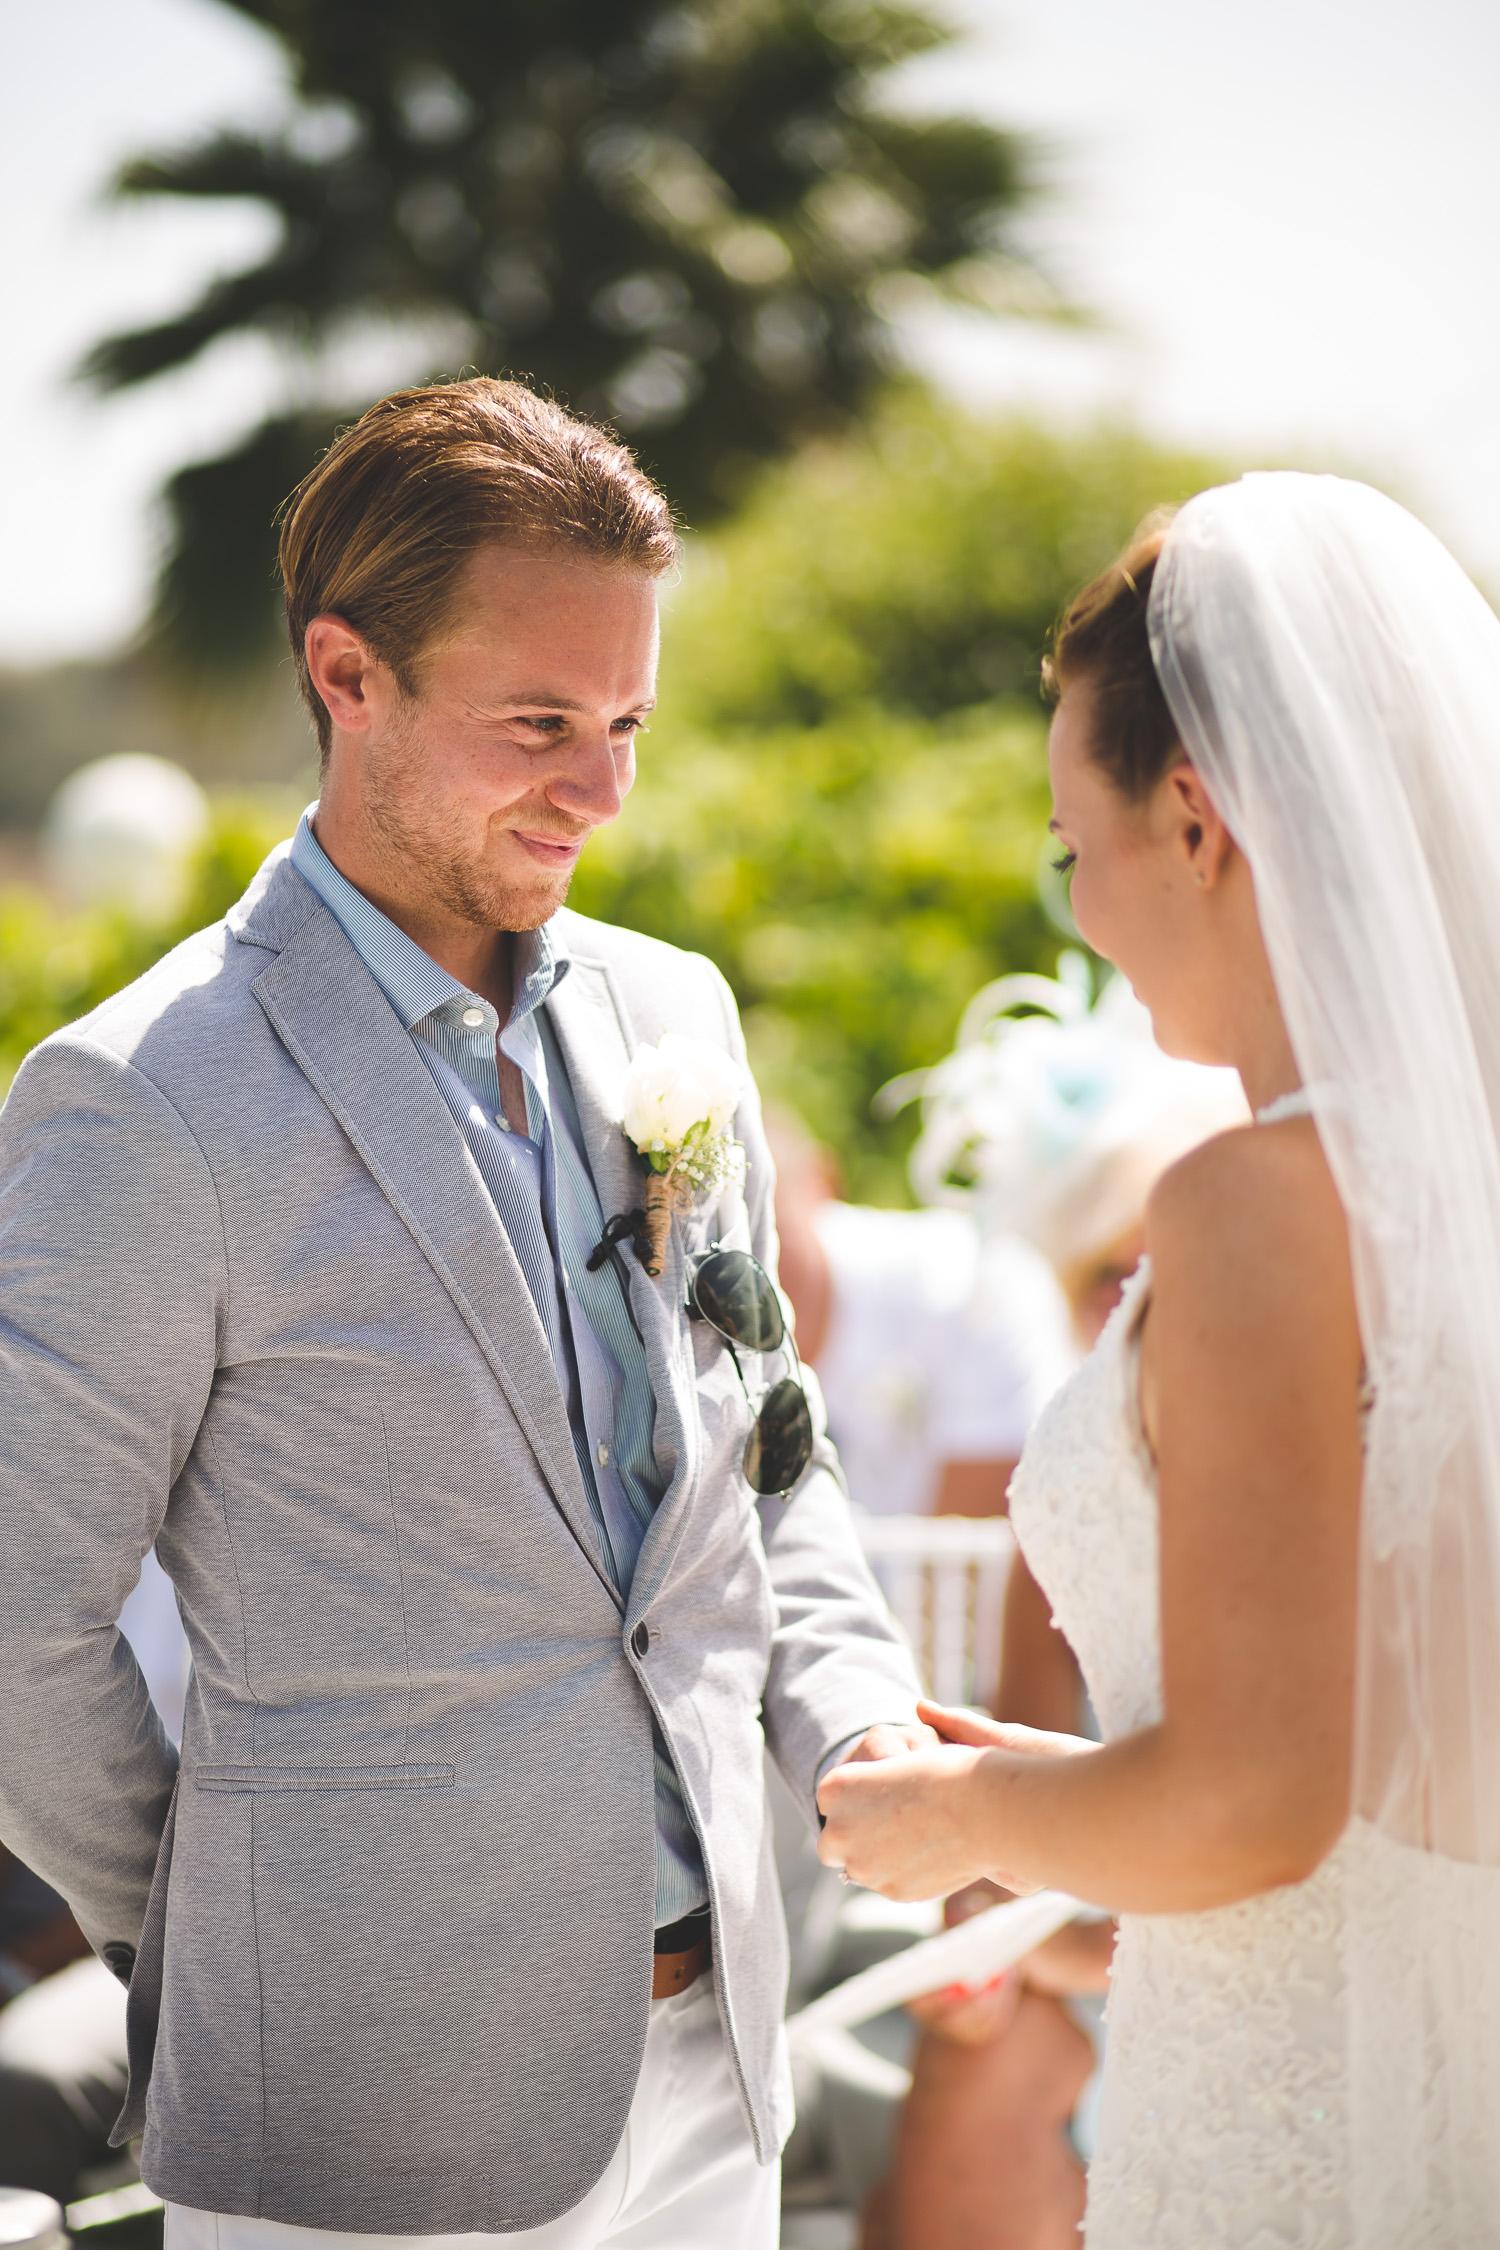 Surrey Wedding Photographer Kit Myers Paige Craig Spain062.jpg